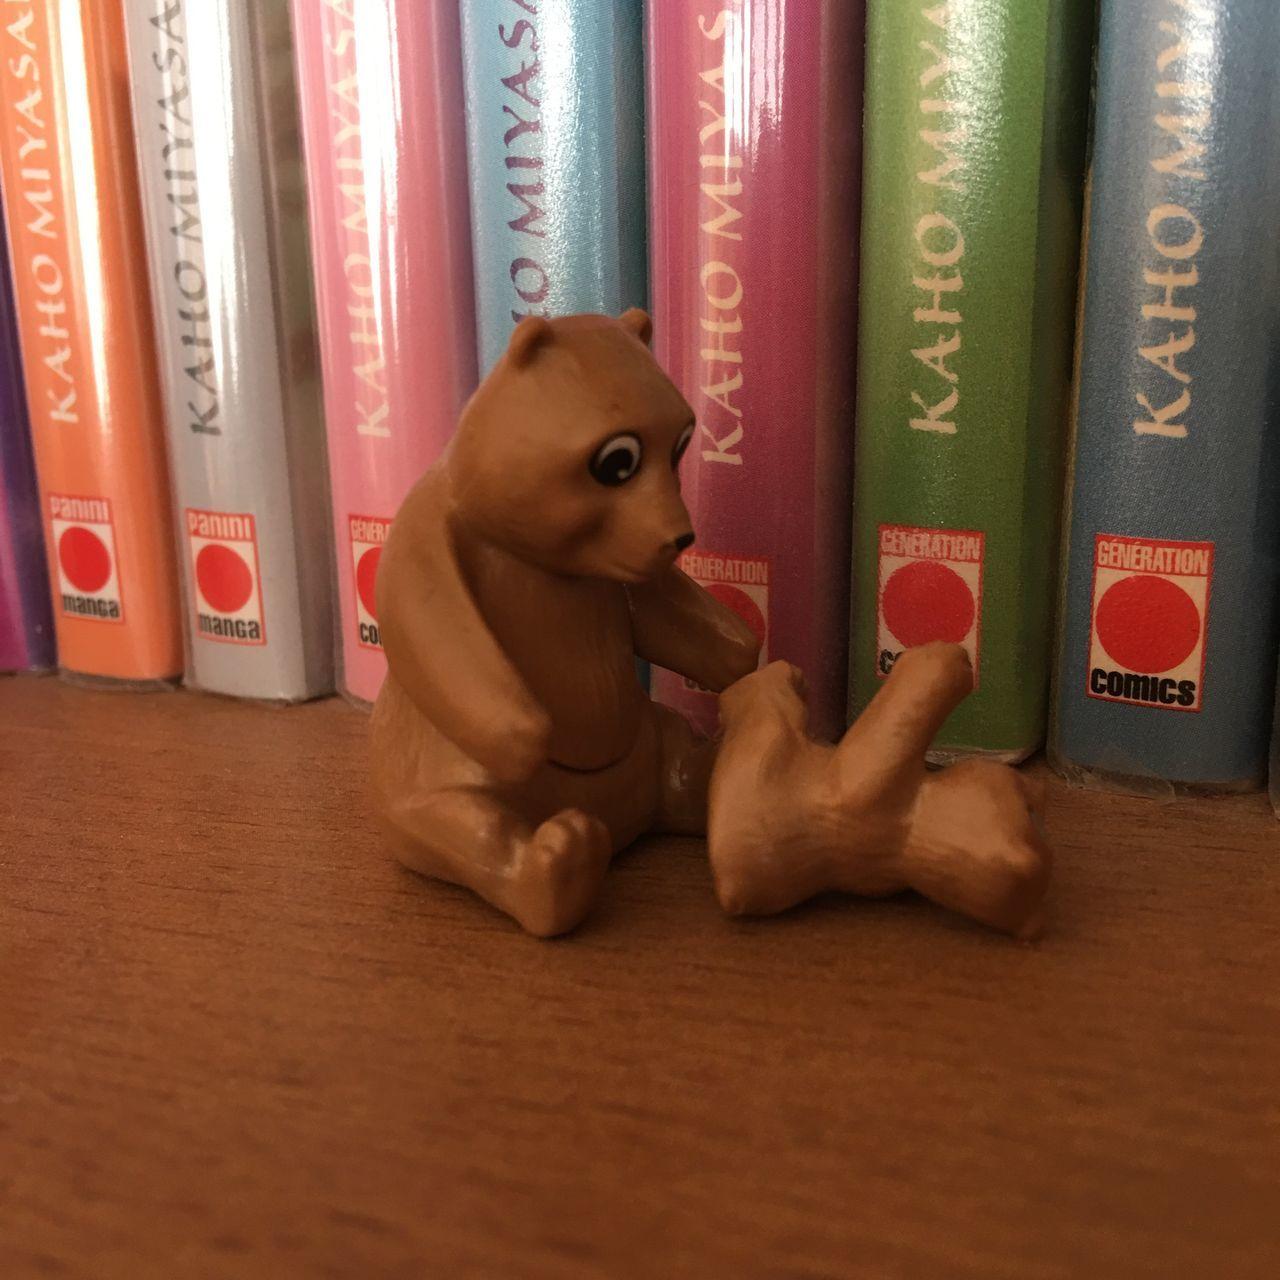 """Baby bear has fallen"" Mammal Animal Themes Indoors  Day Bear Books Manga No People Brown Emotions Toys"